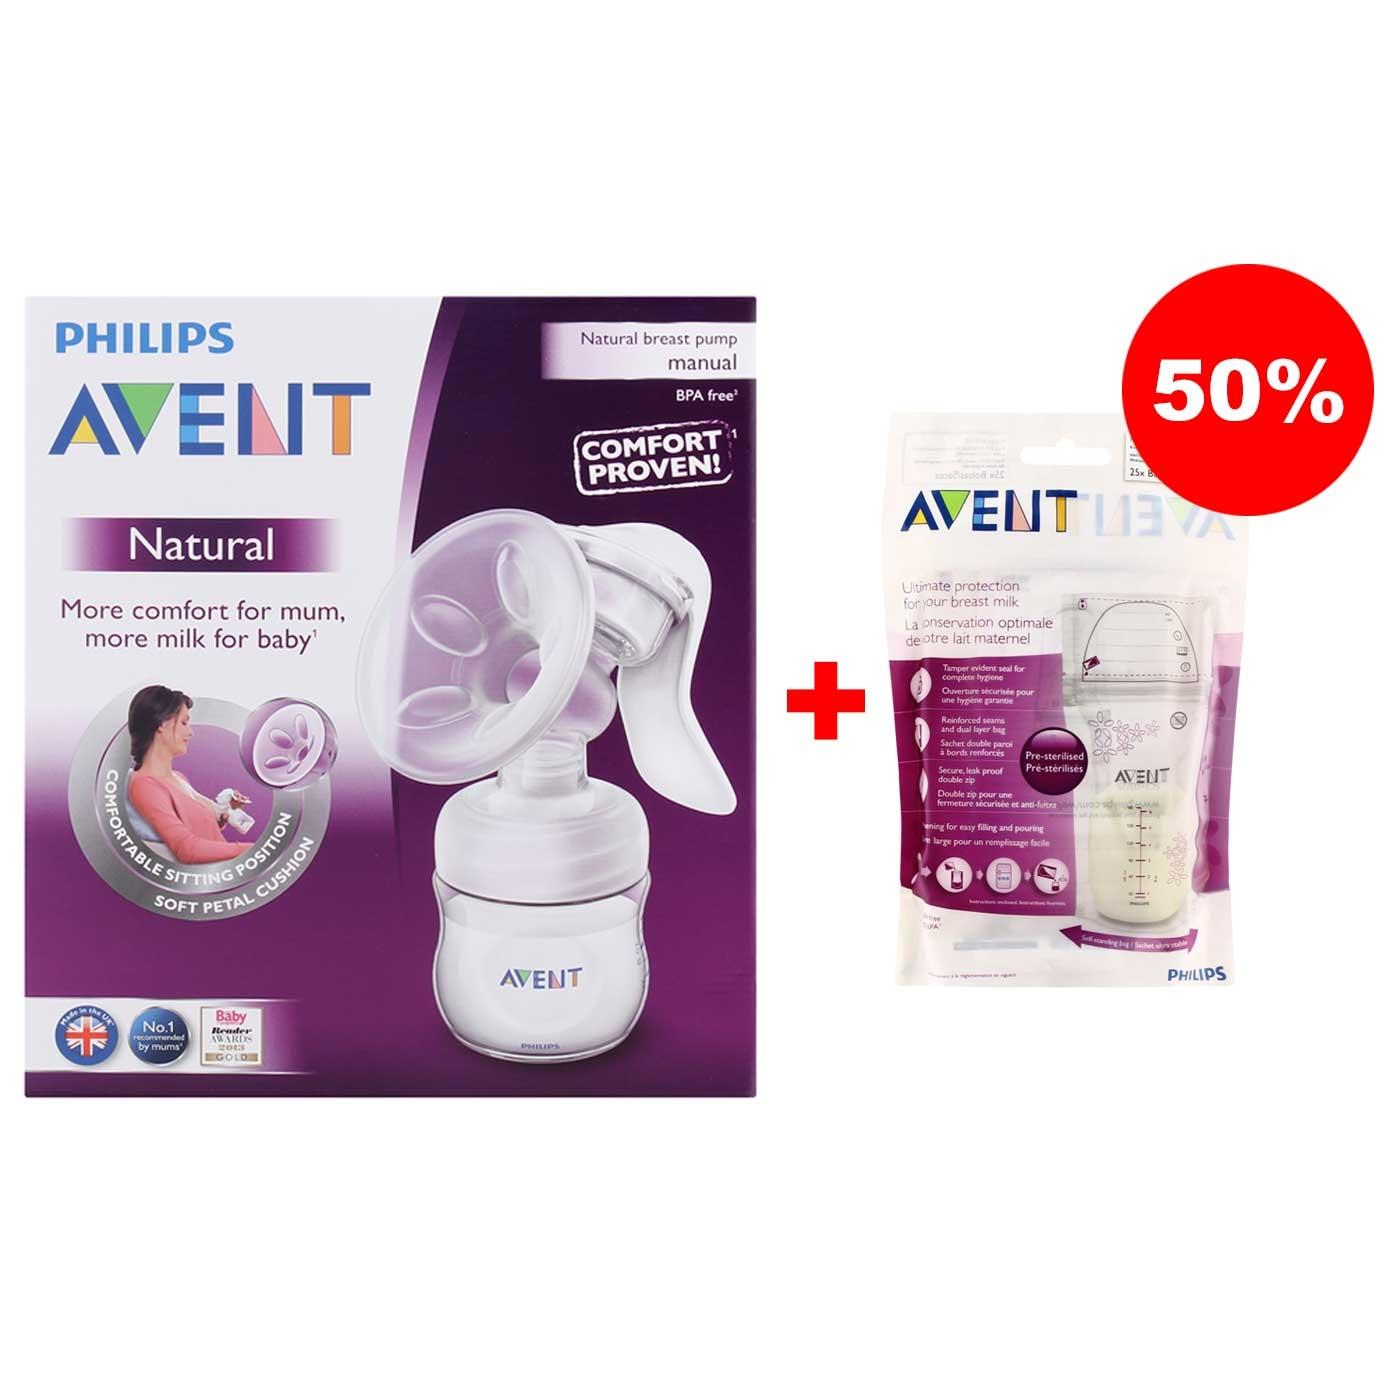 Philips Avent Natural Breastpump Manual Comfort Plus Bottle